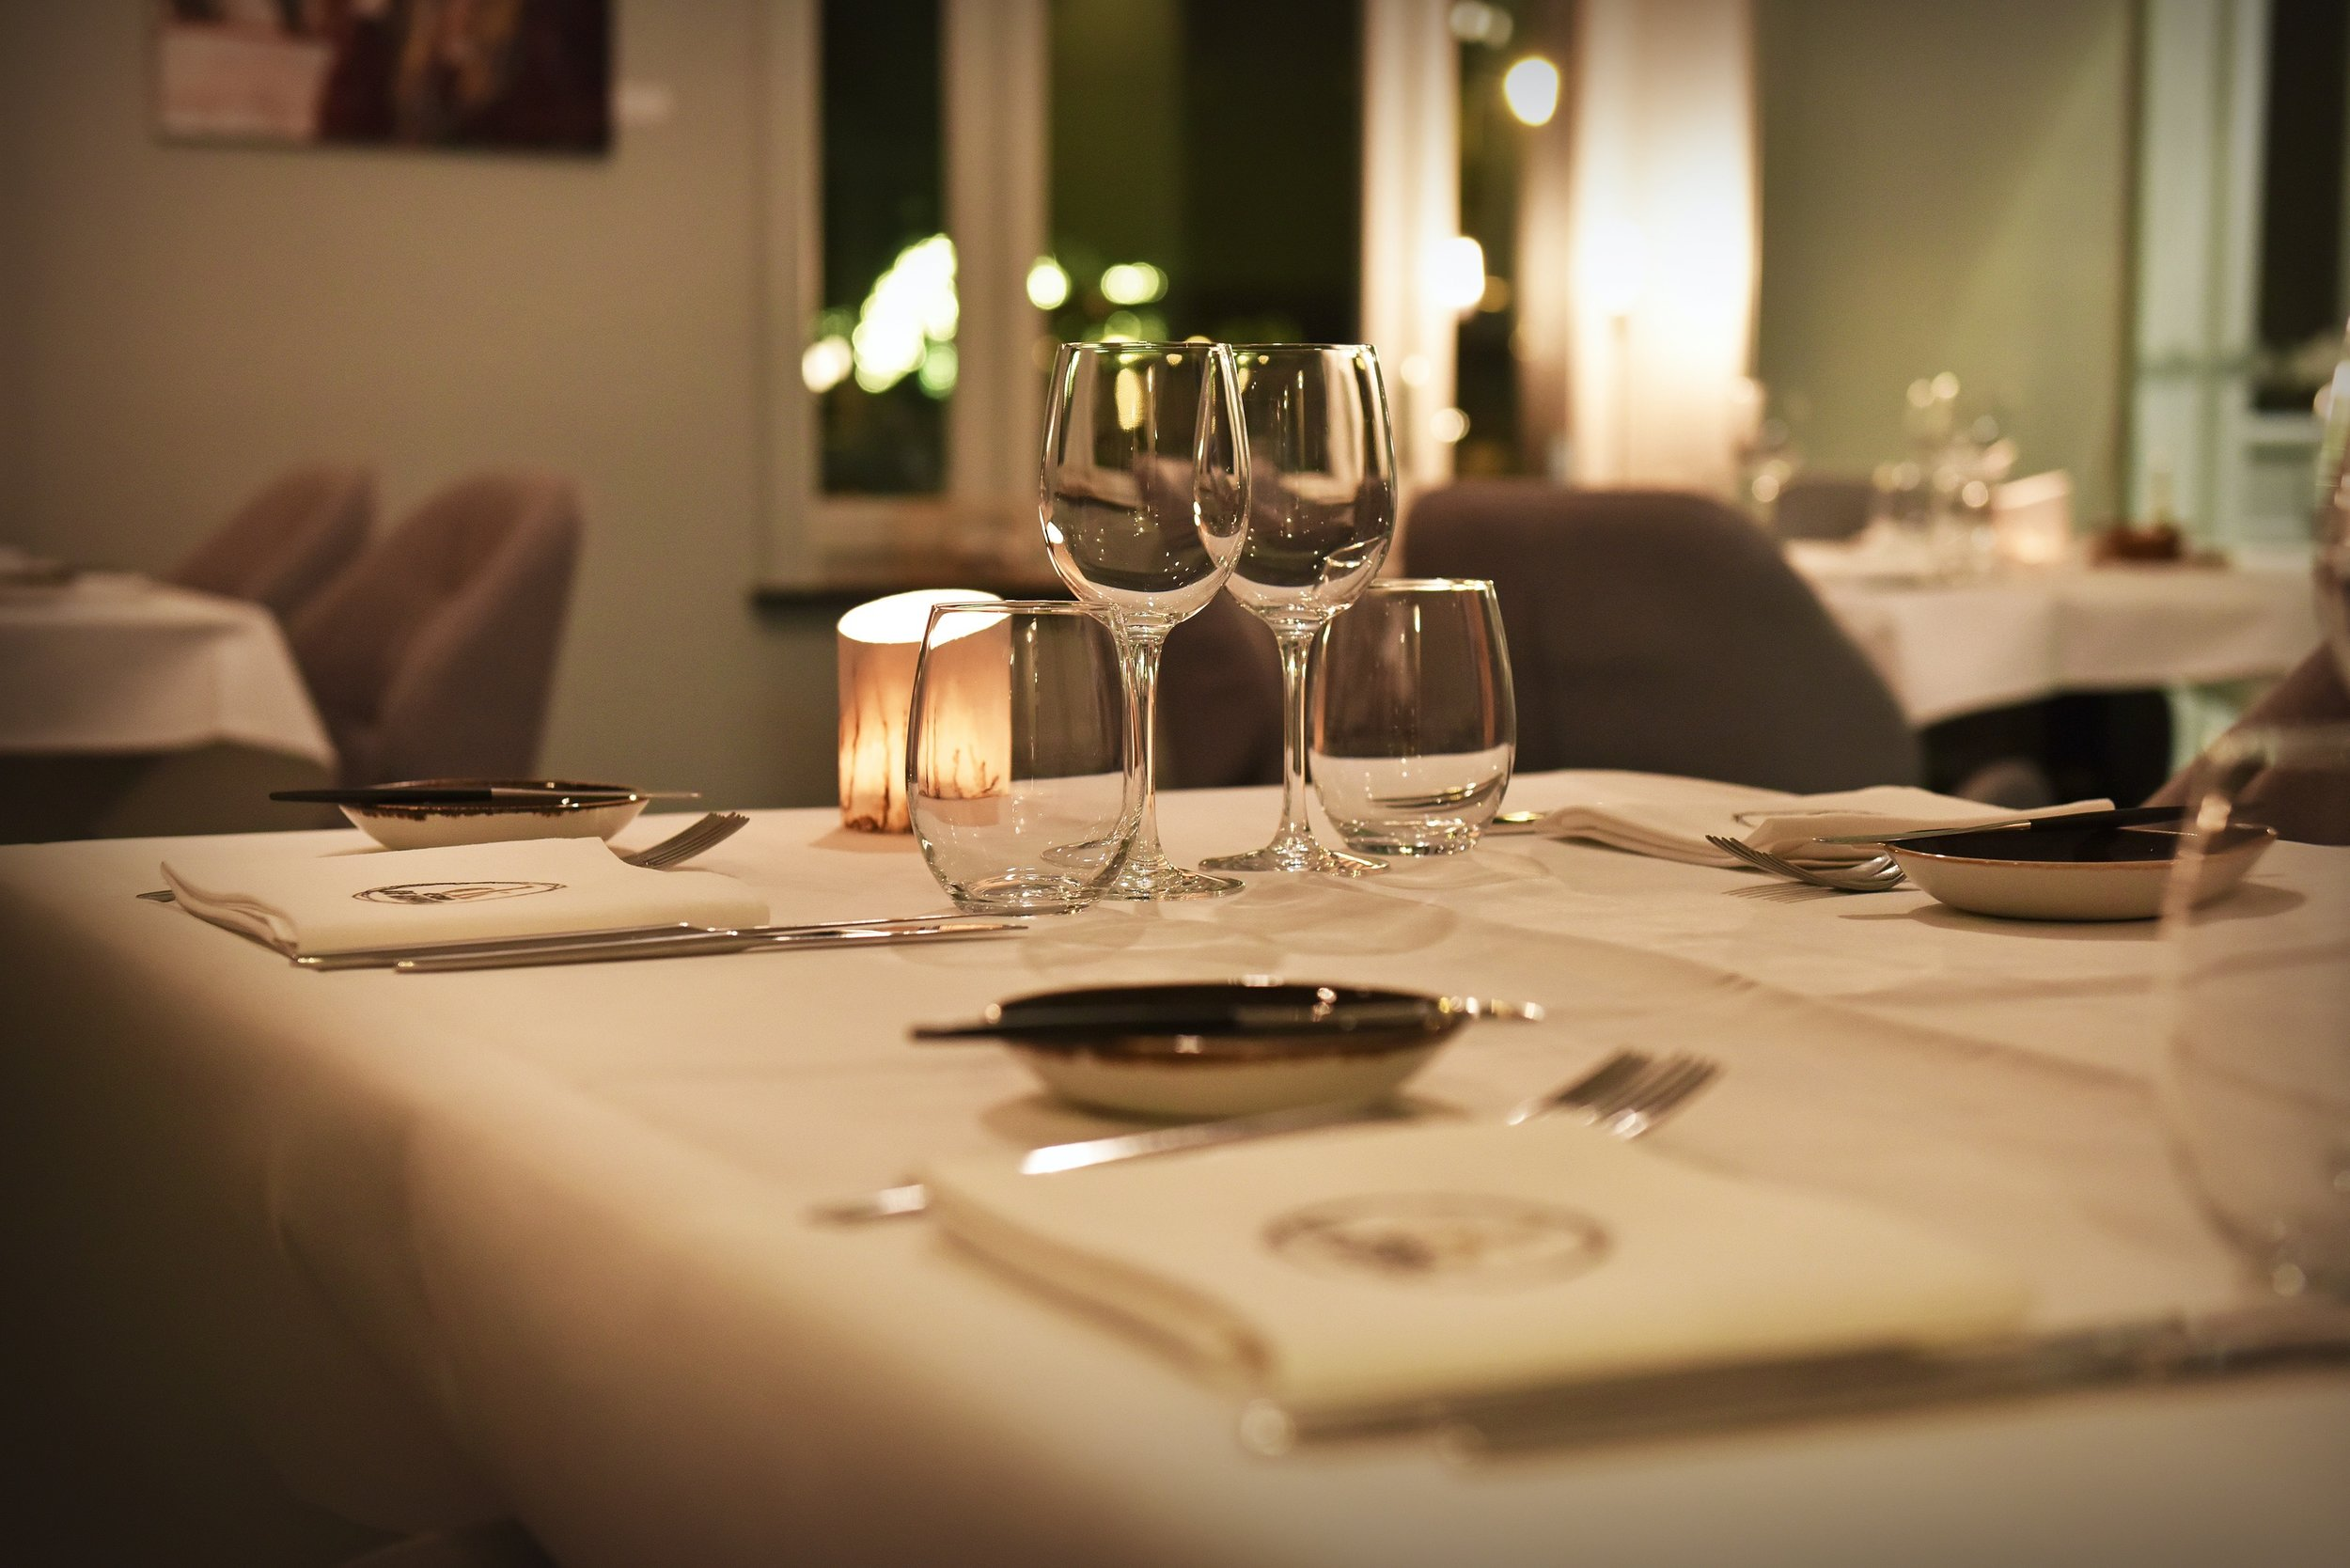 17 restaurant de karper bart albrecht tablefever machelen.jpg.jpg